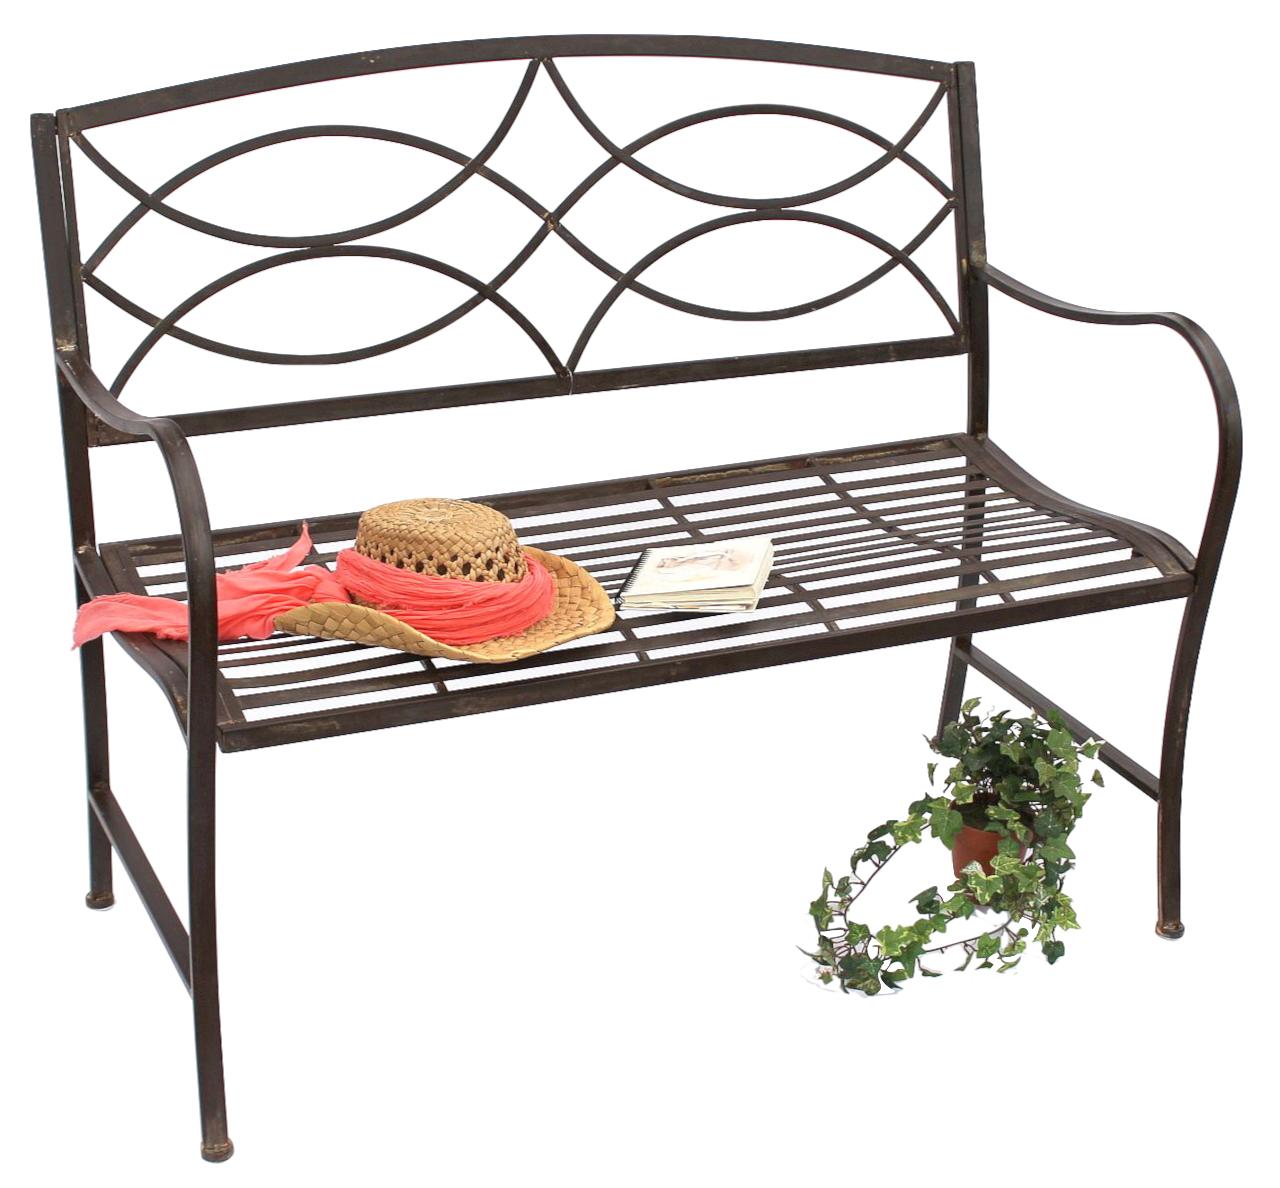 bank gartenbank aus metall sitzbank baumbank 2 sitzer 111185 109 cm parkbank ebay. Black Bedroom Furniture Sets. Home Design Ideas